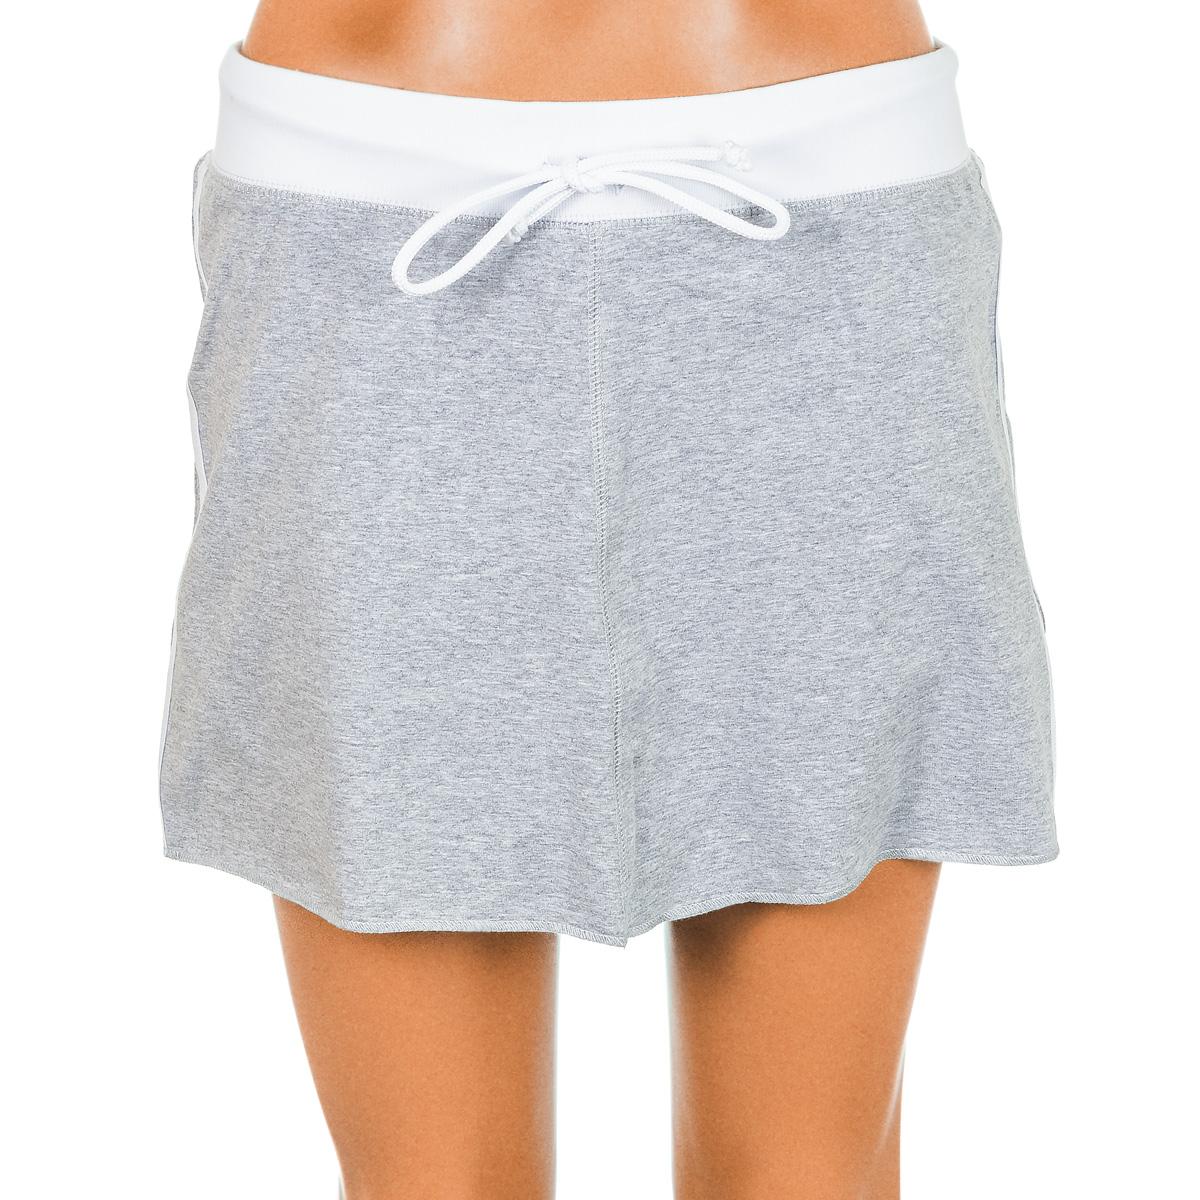 Жен. шорты арт. 04-0051 р. 44 пижама жен mia cara майка шорты botanical aw15 ubl lst 264 р 42 44 1119503